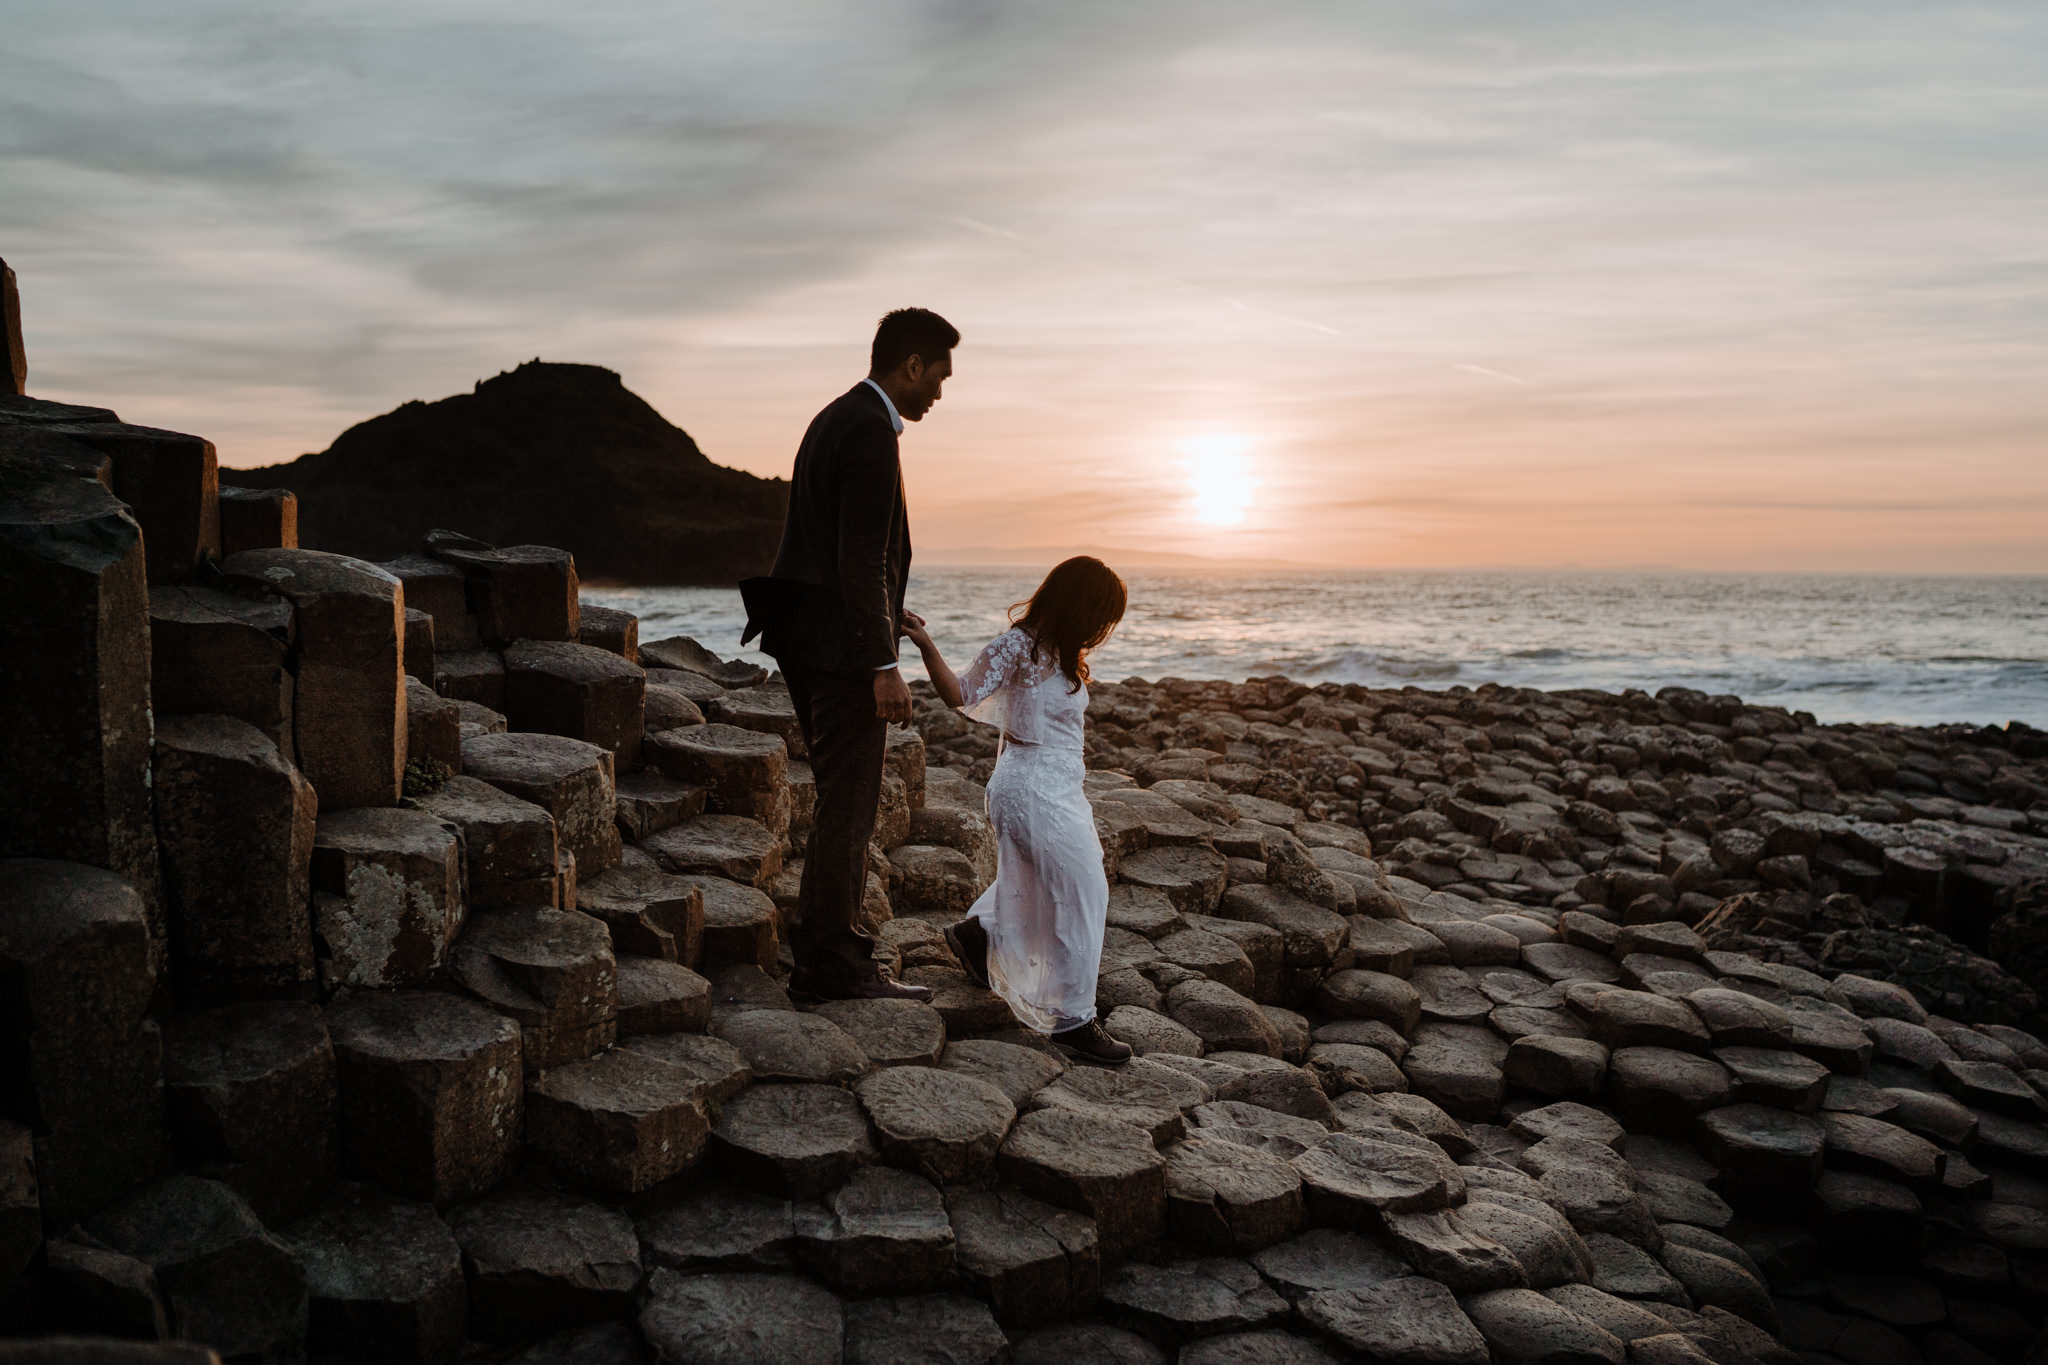 giants-causeway-adventure-pre-wedding-session